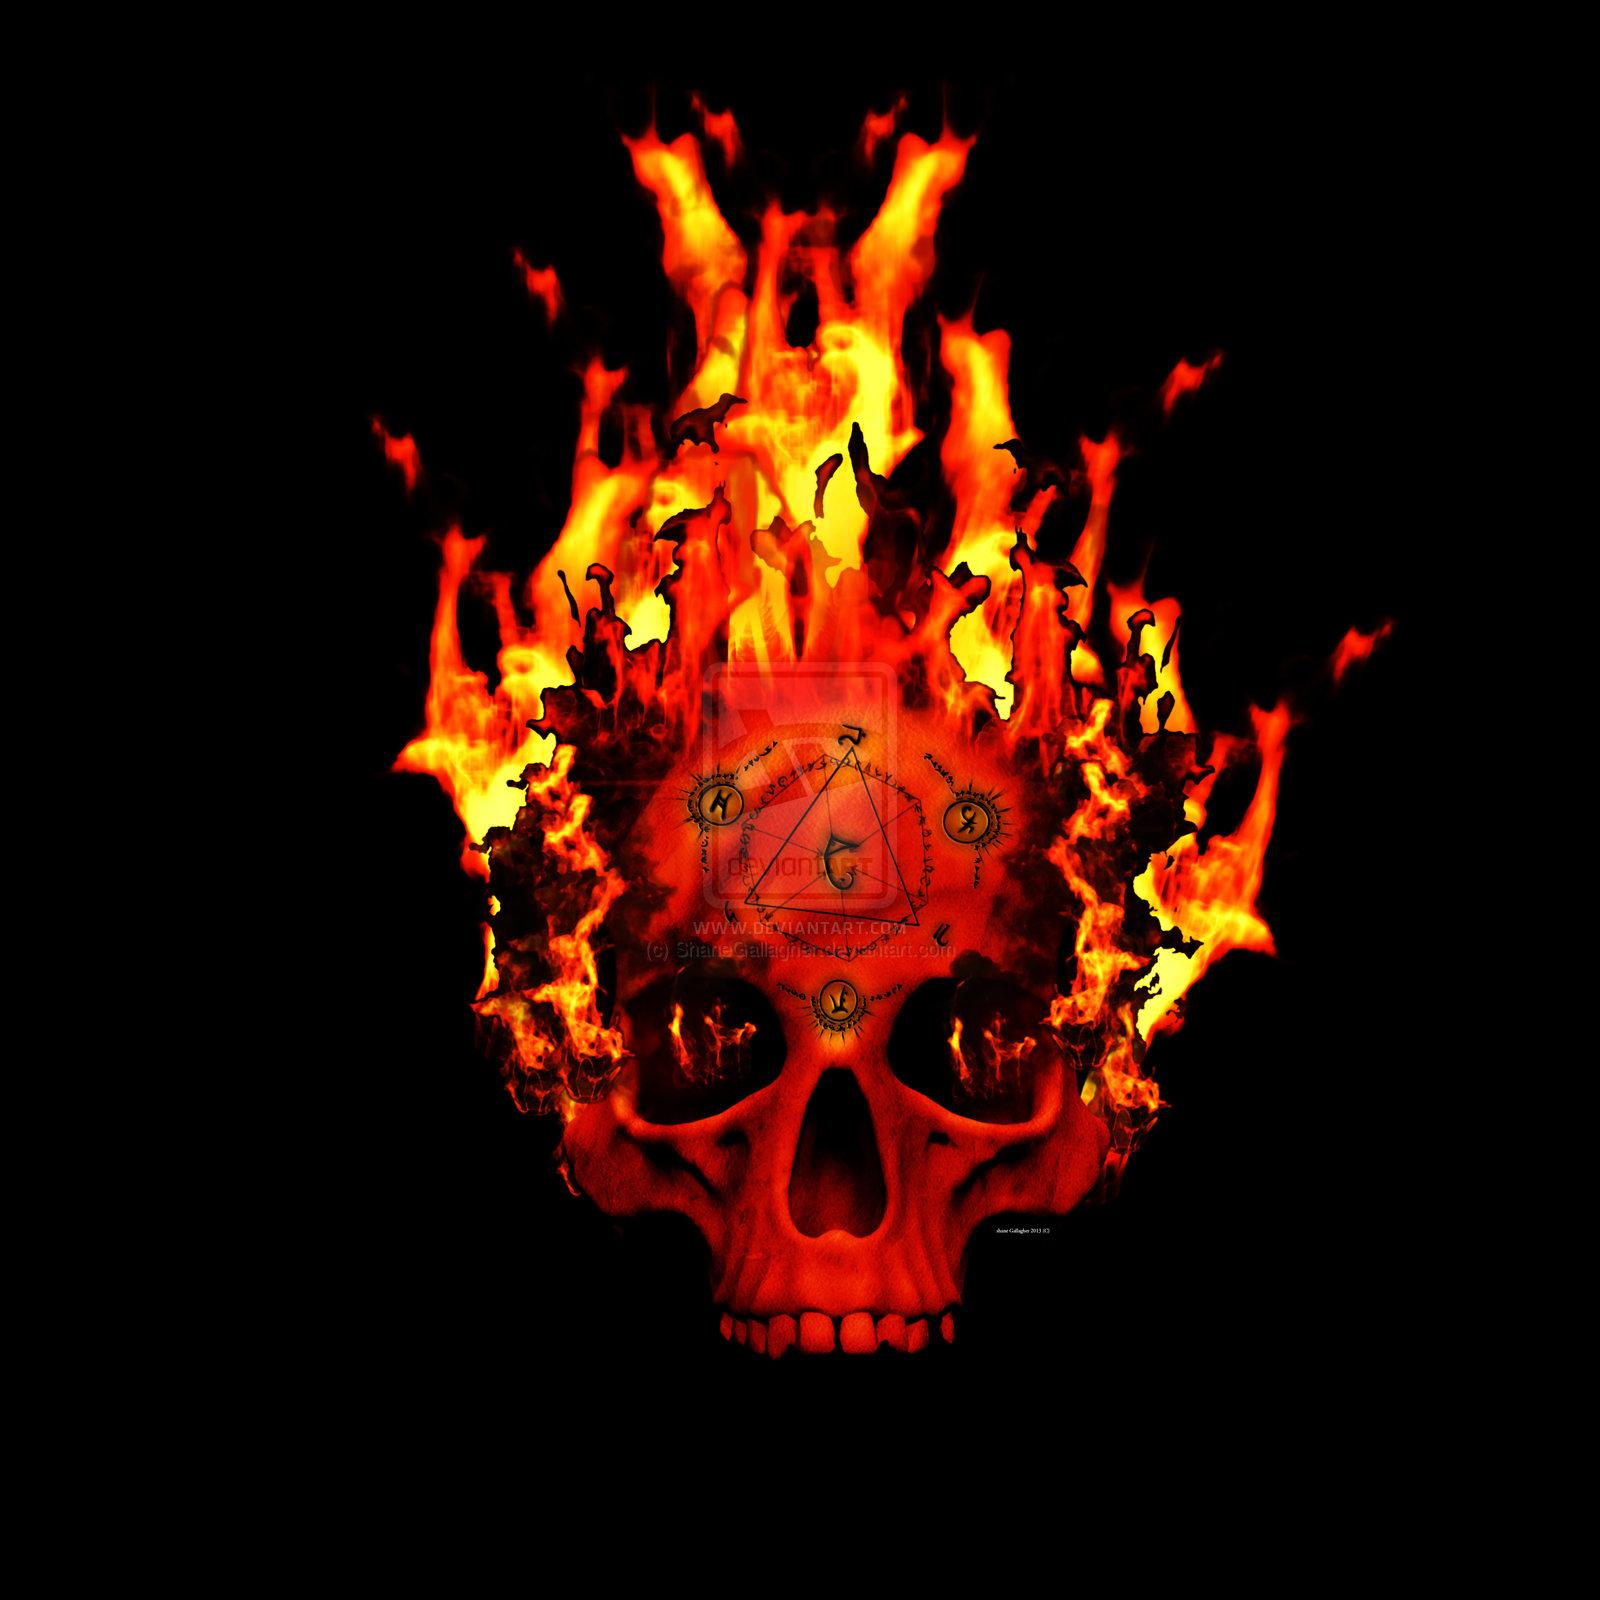 skull-flames-Google-Search-wallpaper-wp422490